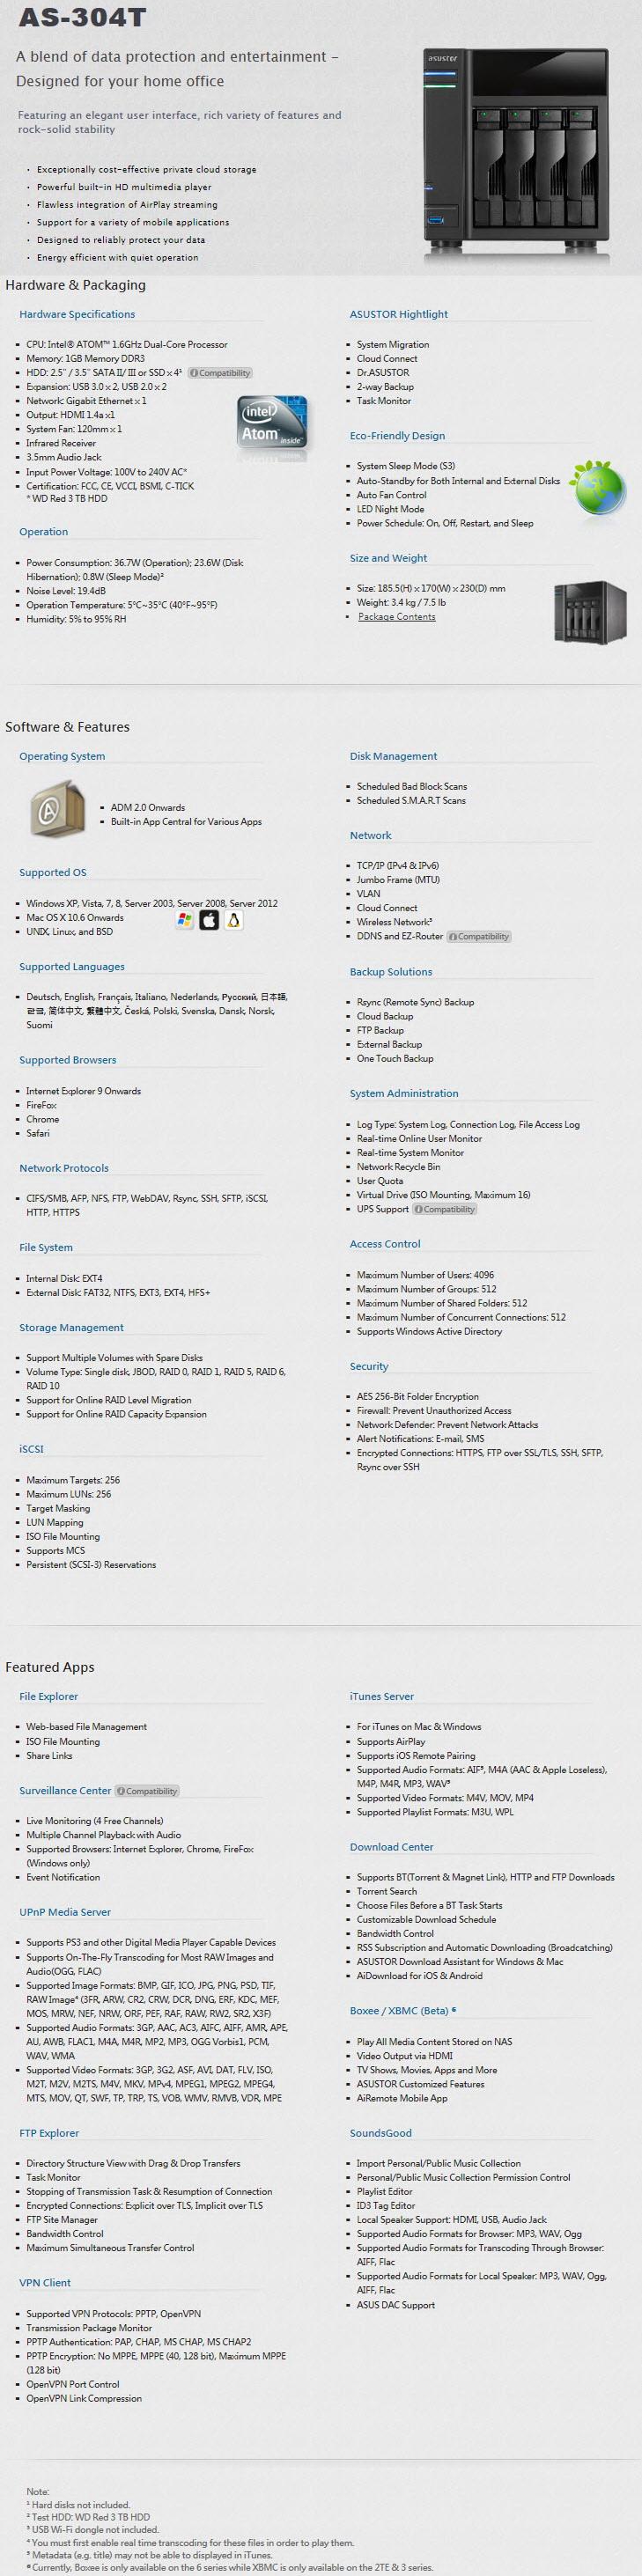 ASUSTOR AS-304T NAS Server Review